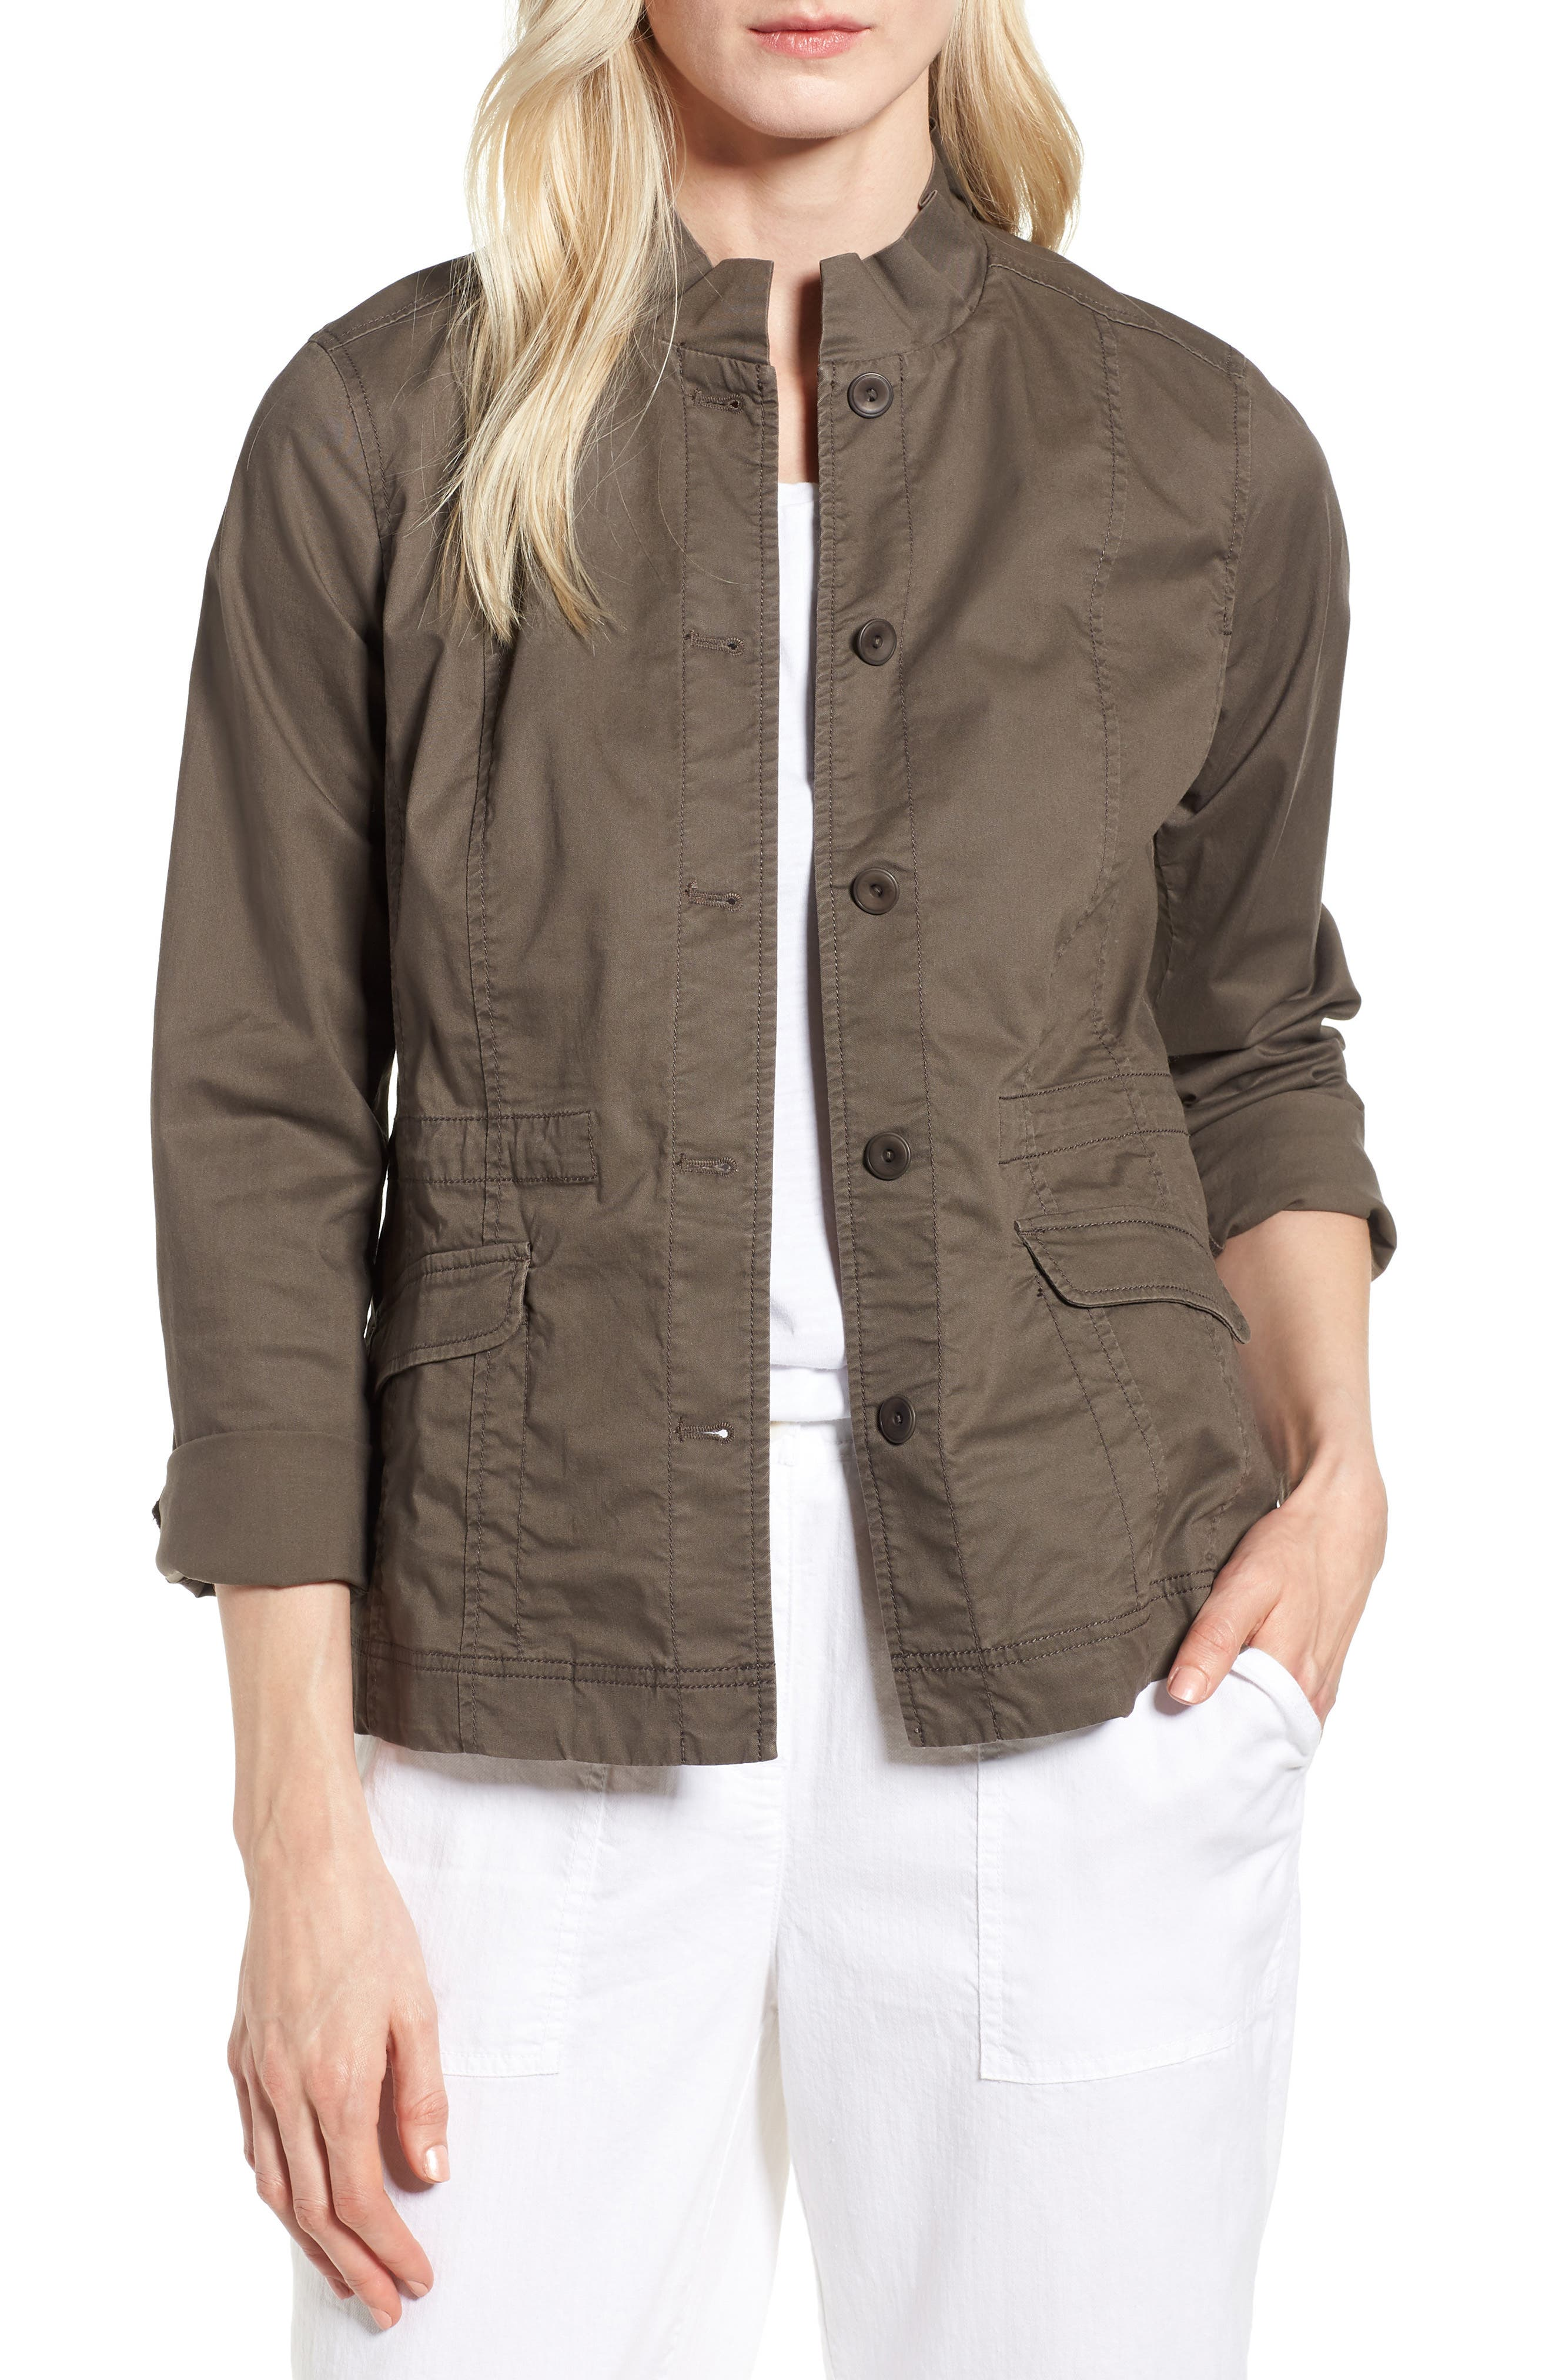 Ruffle Collar Organic Cotton Blend Jacket,                             Main thumbnail 1, color,                             Rye